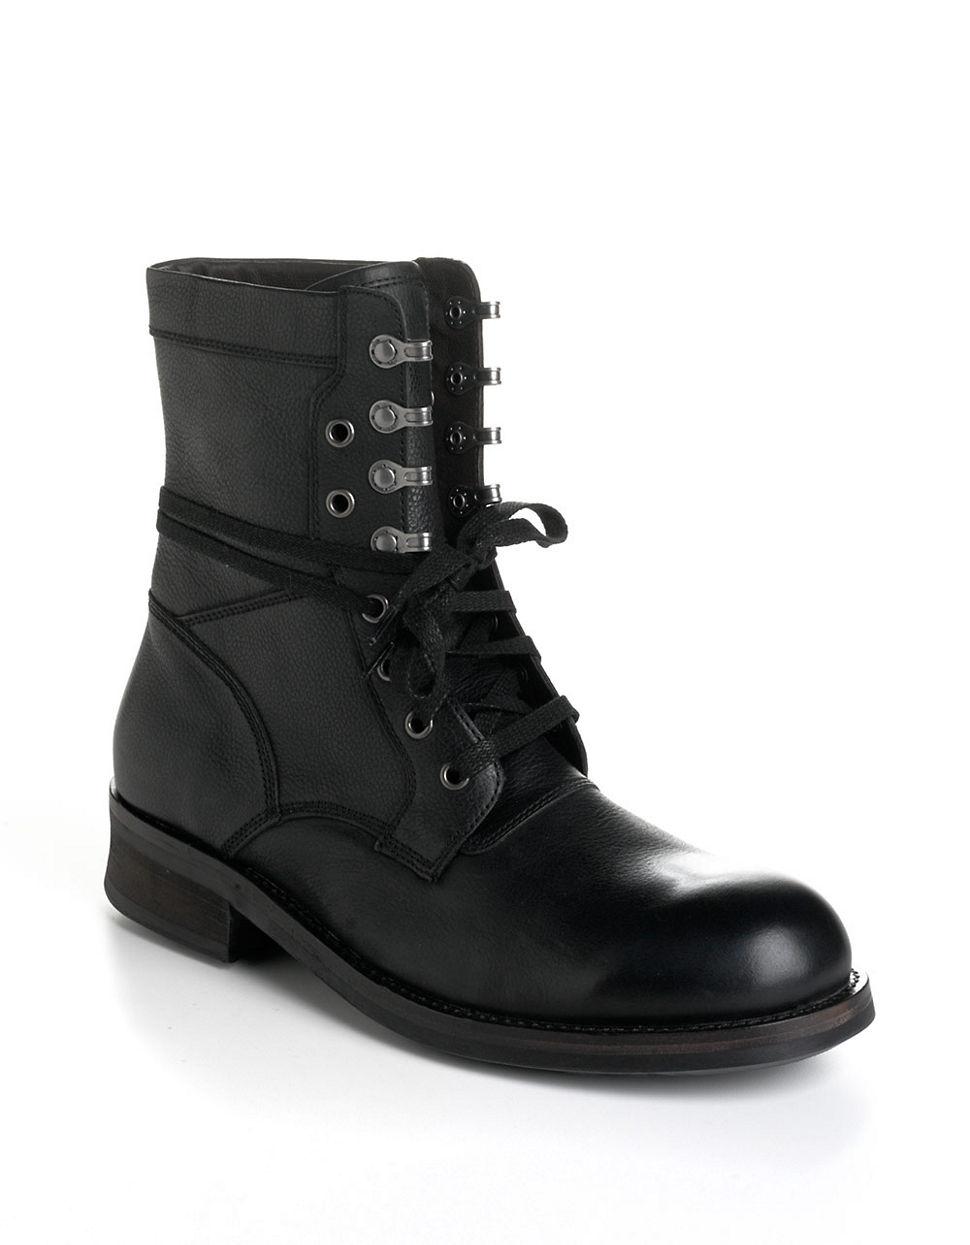 John Varvatos Leather Moto Combat Boots In Black For Men